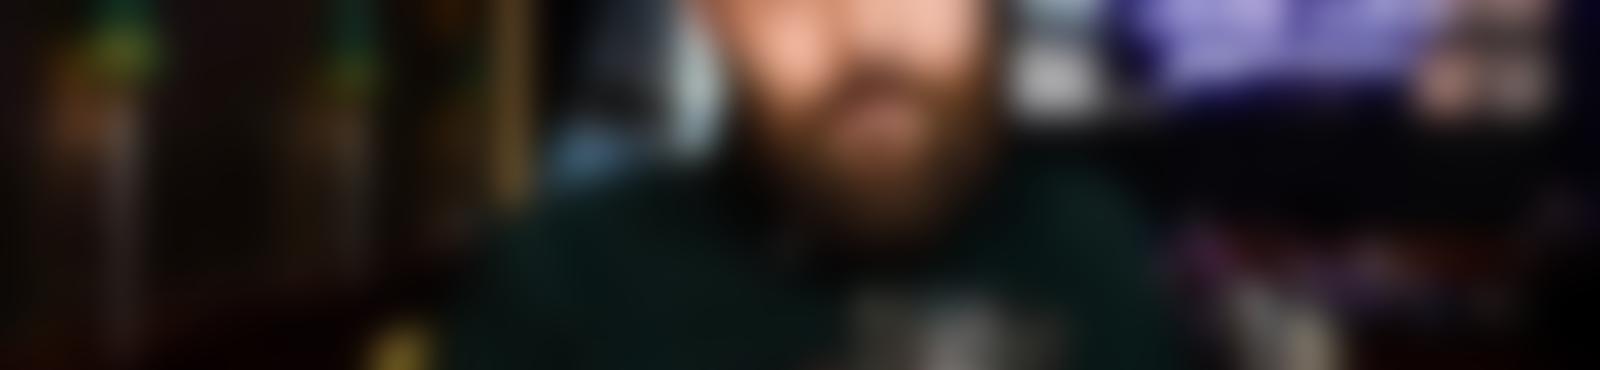 Blurred c155e248 588f 4cd2 b57e 5065b787aab9